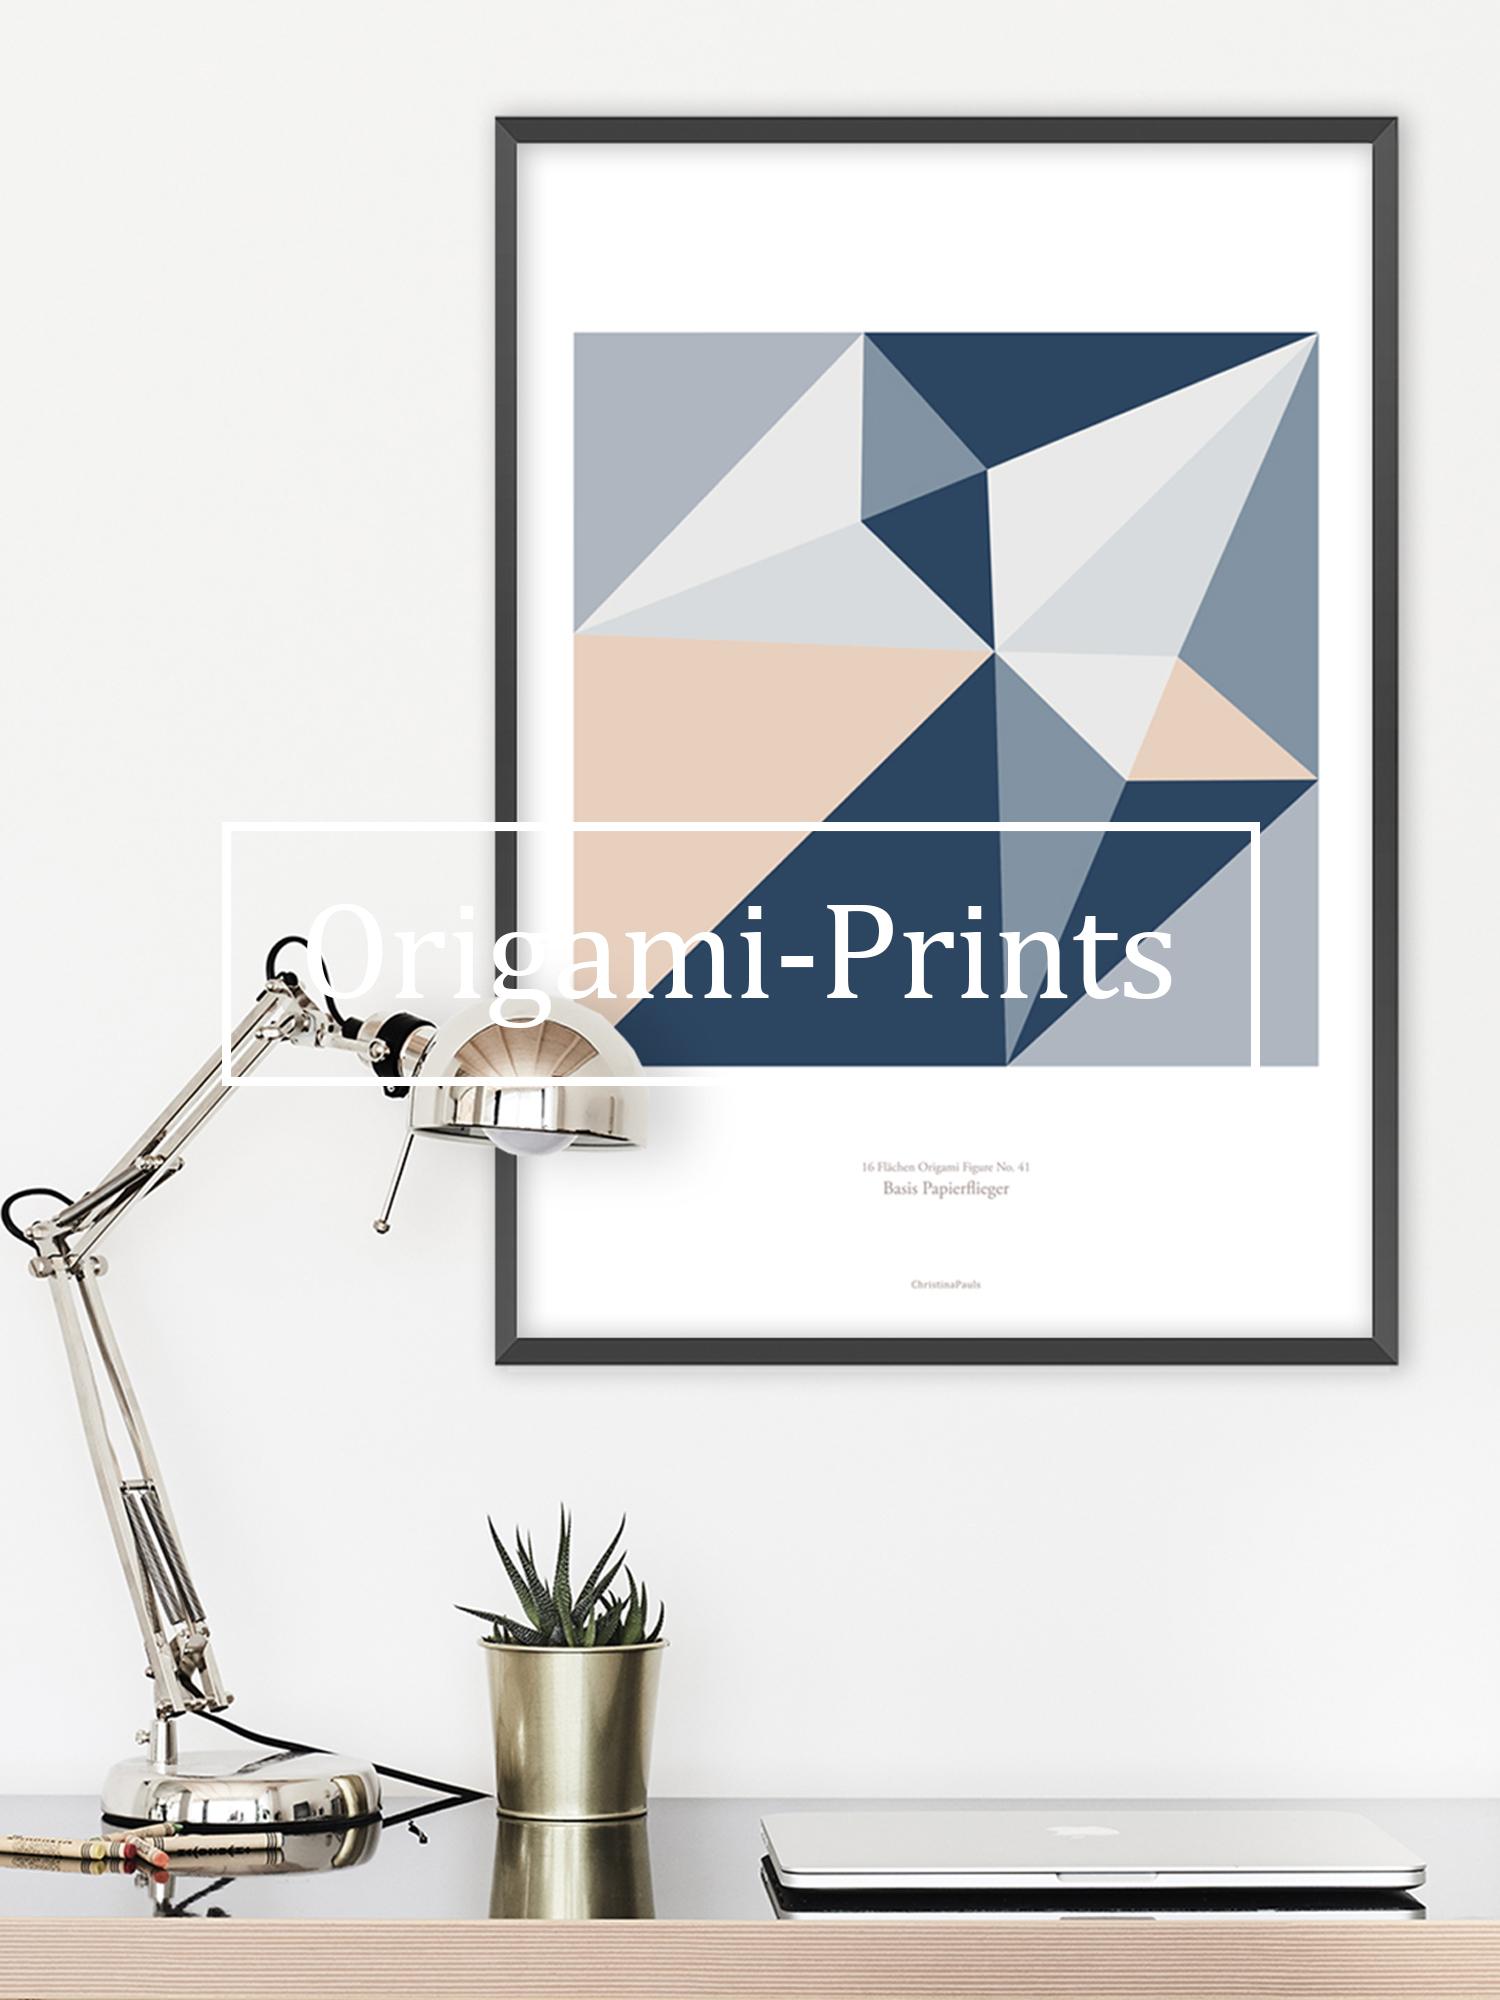 Christina-Pauls-Origami-Poster-Kunstdruck-Papier-mehrfarbig-Düsenflieger.jpg